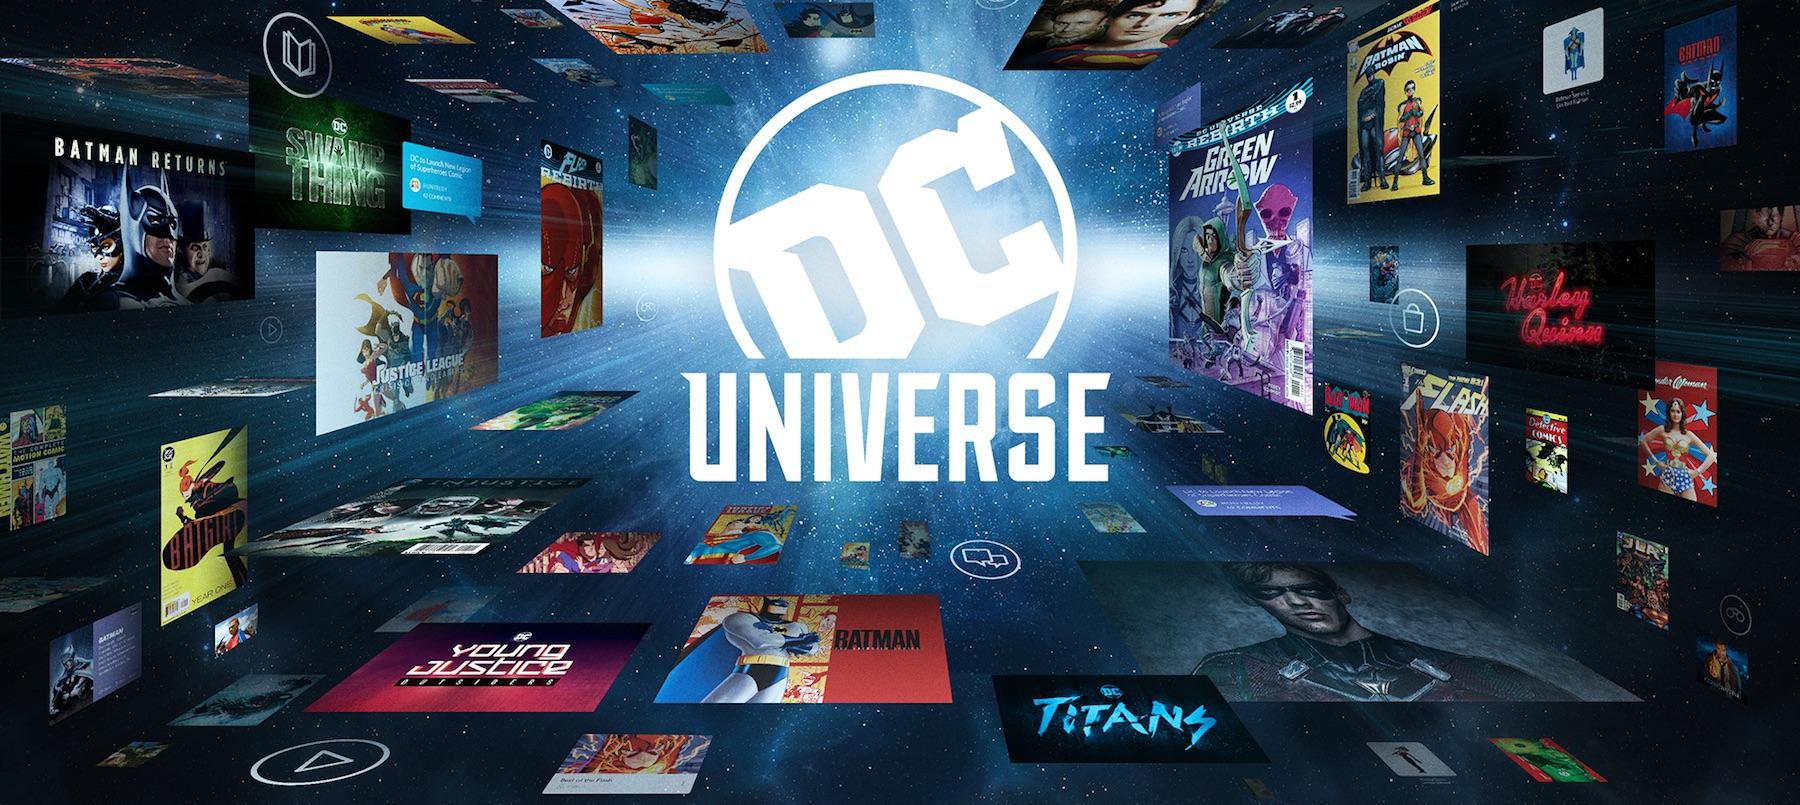 DC Universe Banner